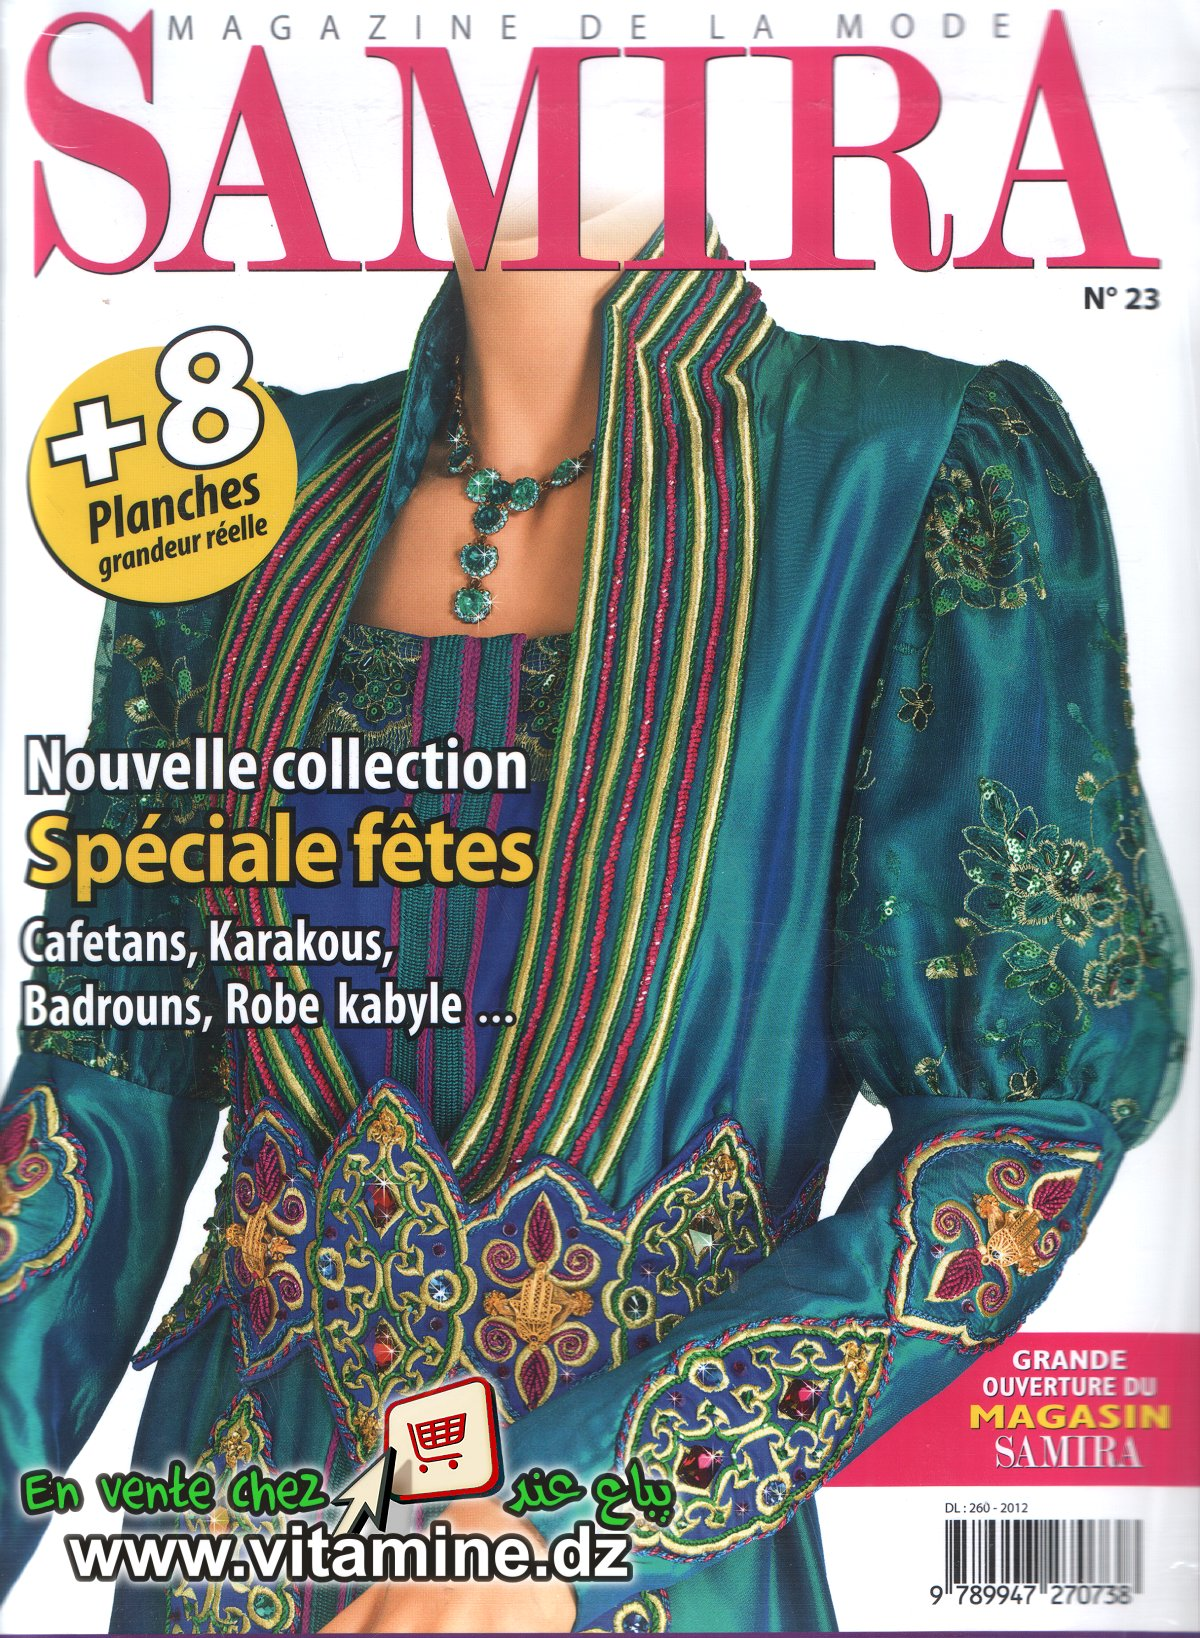 Samira N°23 - Magazine de Mode